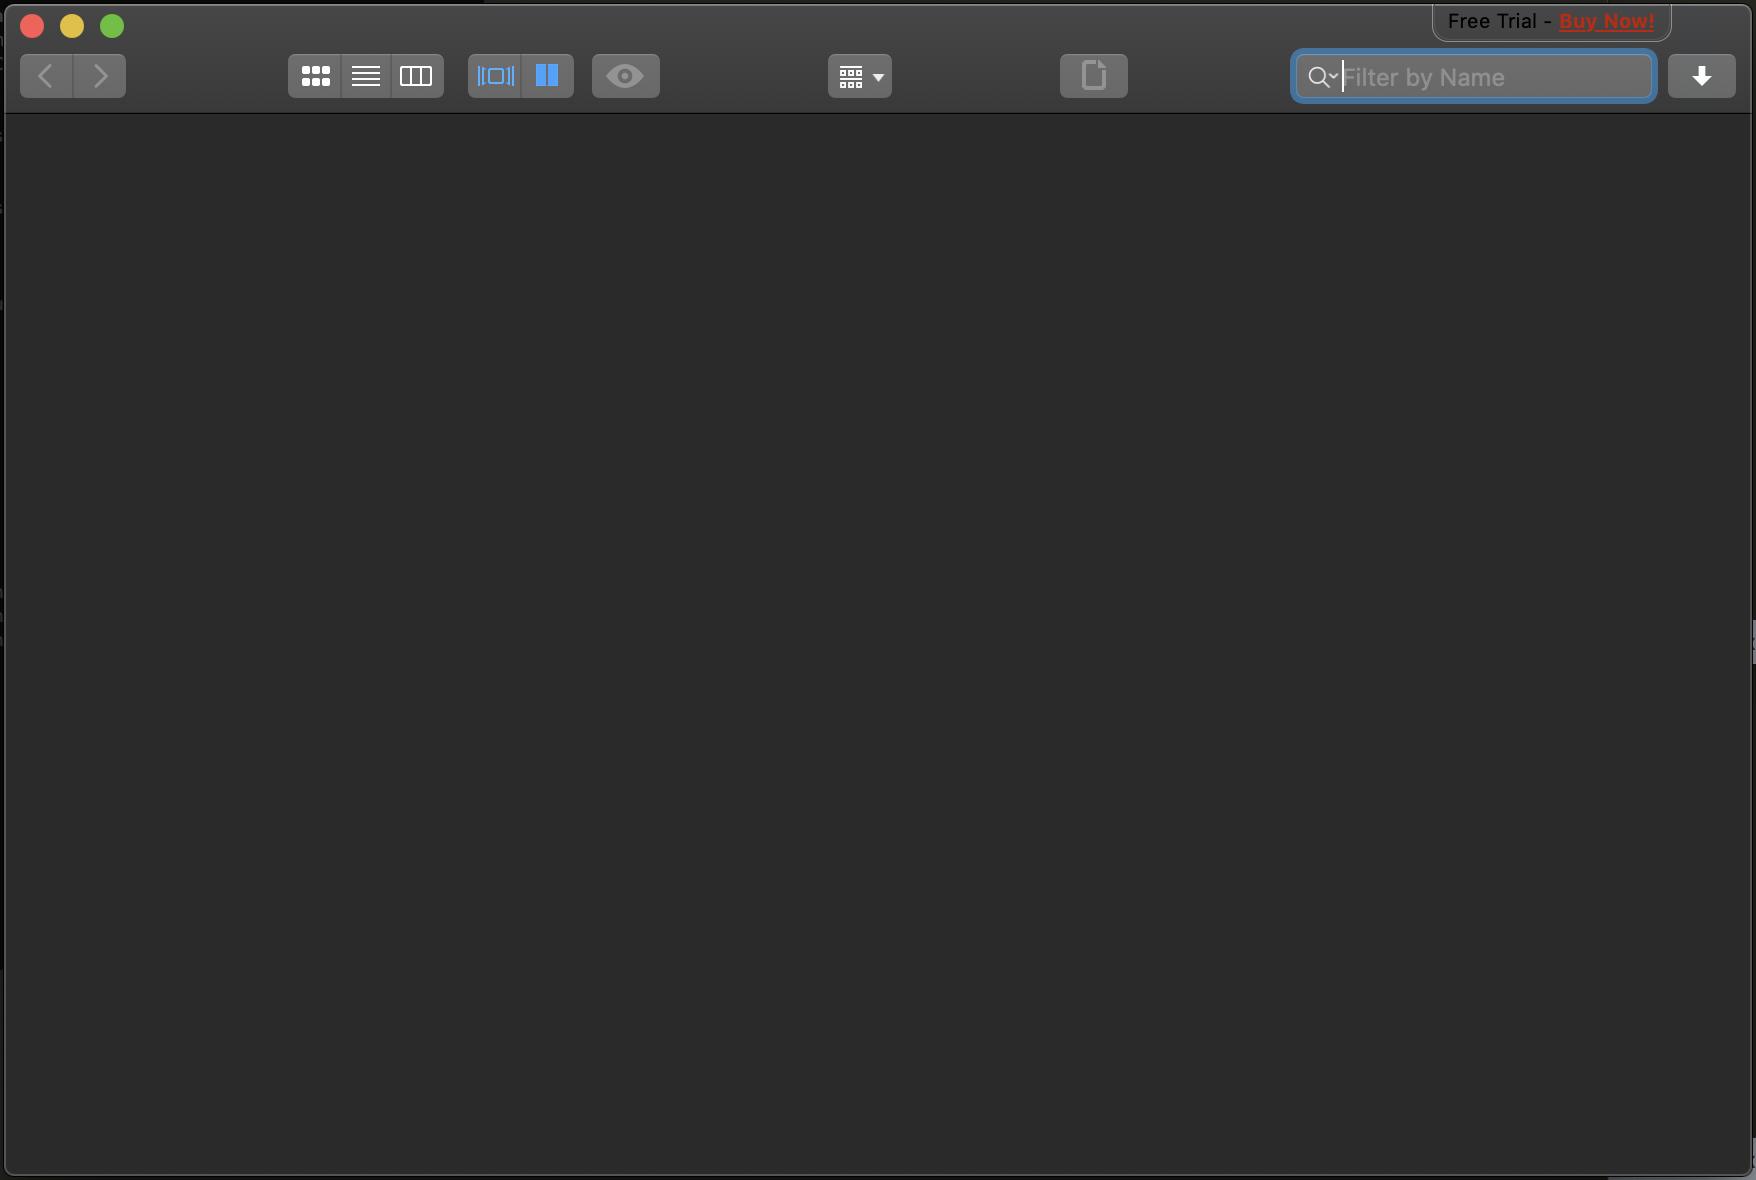 Screenshot-8-3-3_blank_screen